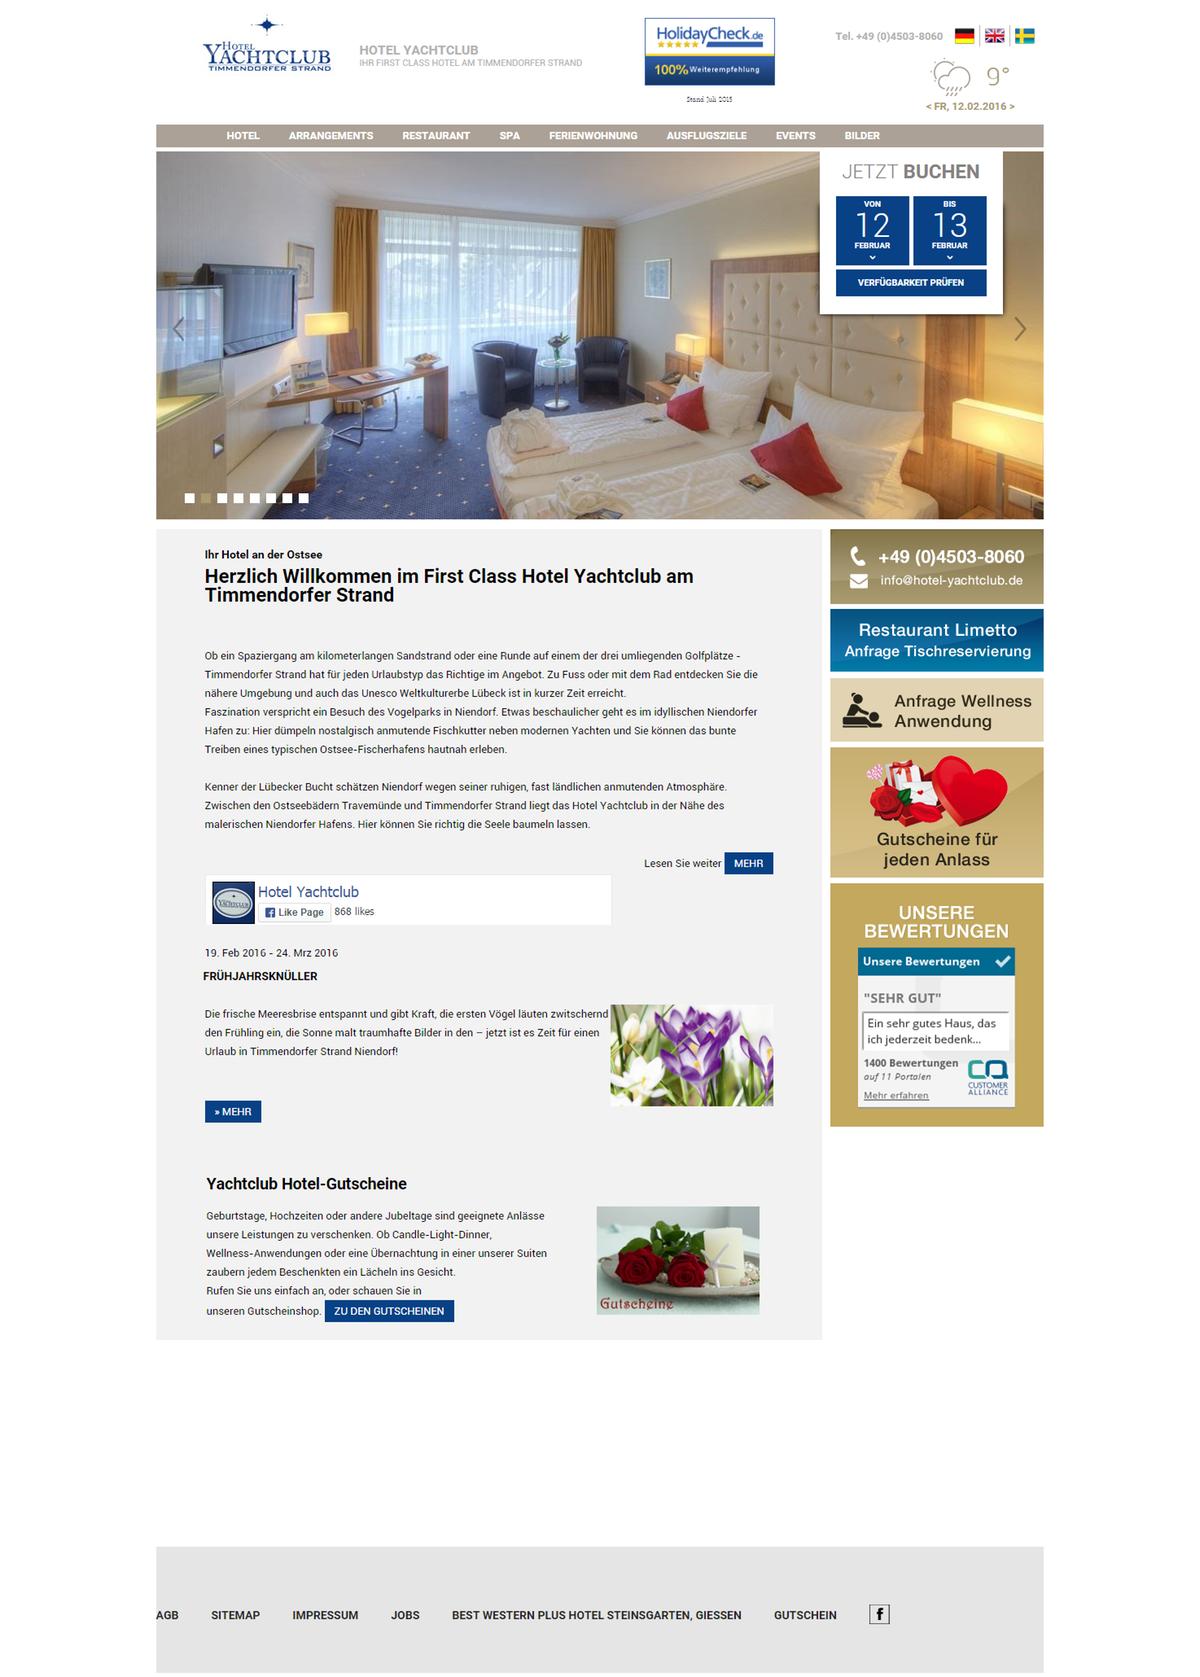 Hotel Yachtclub Baltic Sea, Selling Bar in 3 Variants